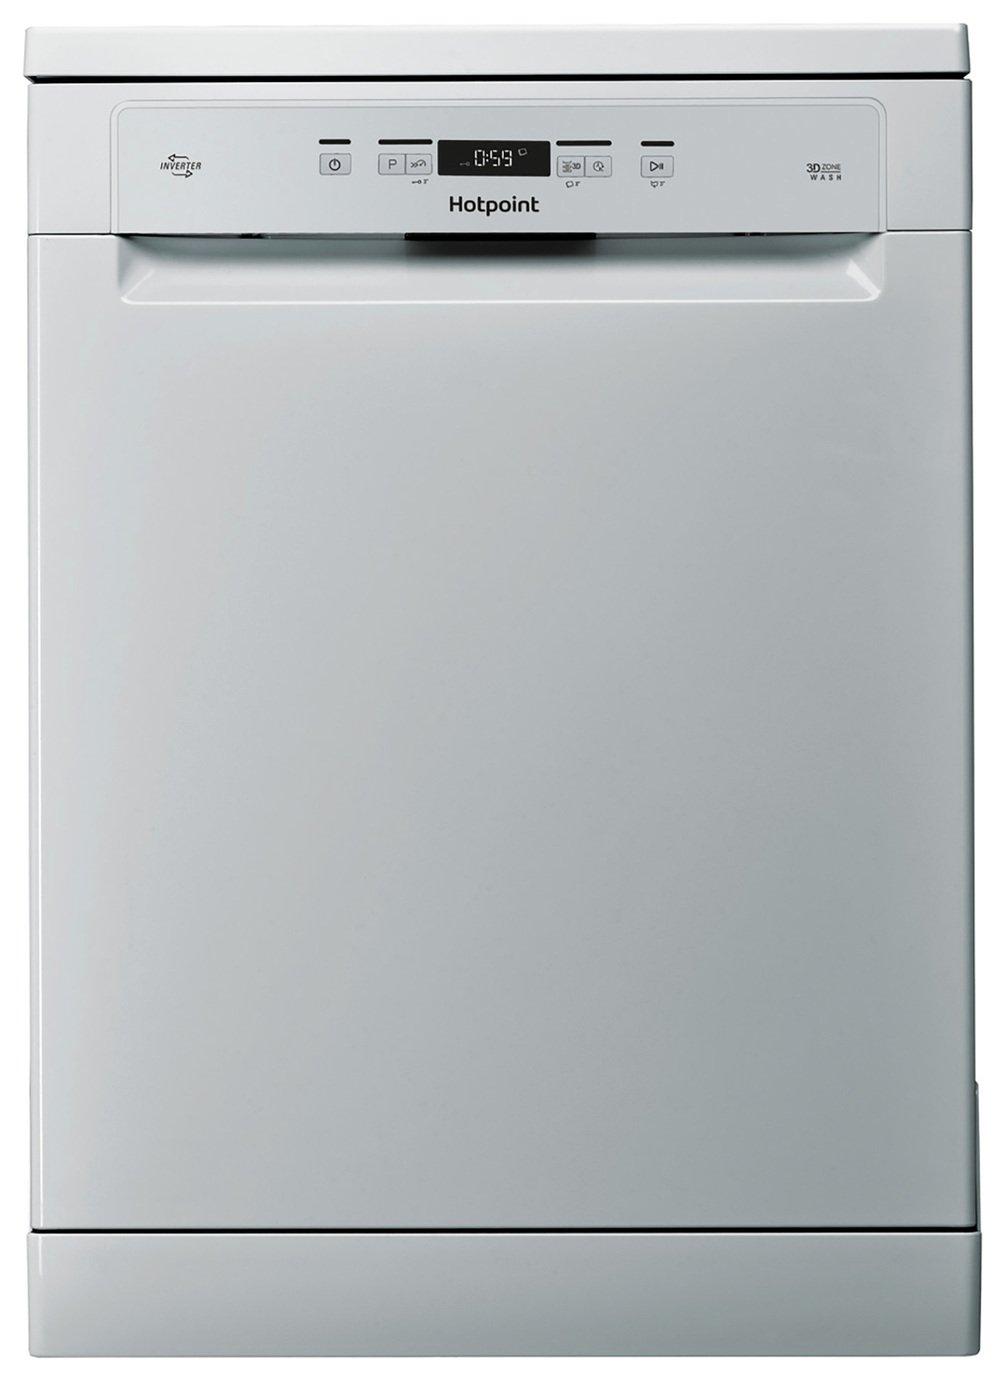 Hotpoint HFC3C26WSV Full Size Dishwasher - Silver